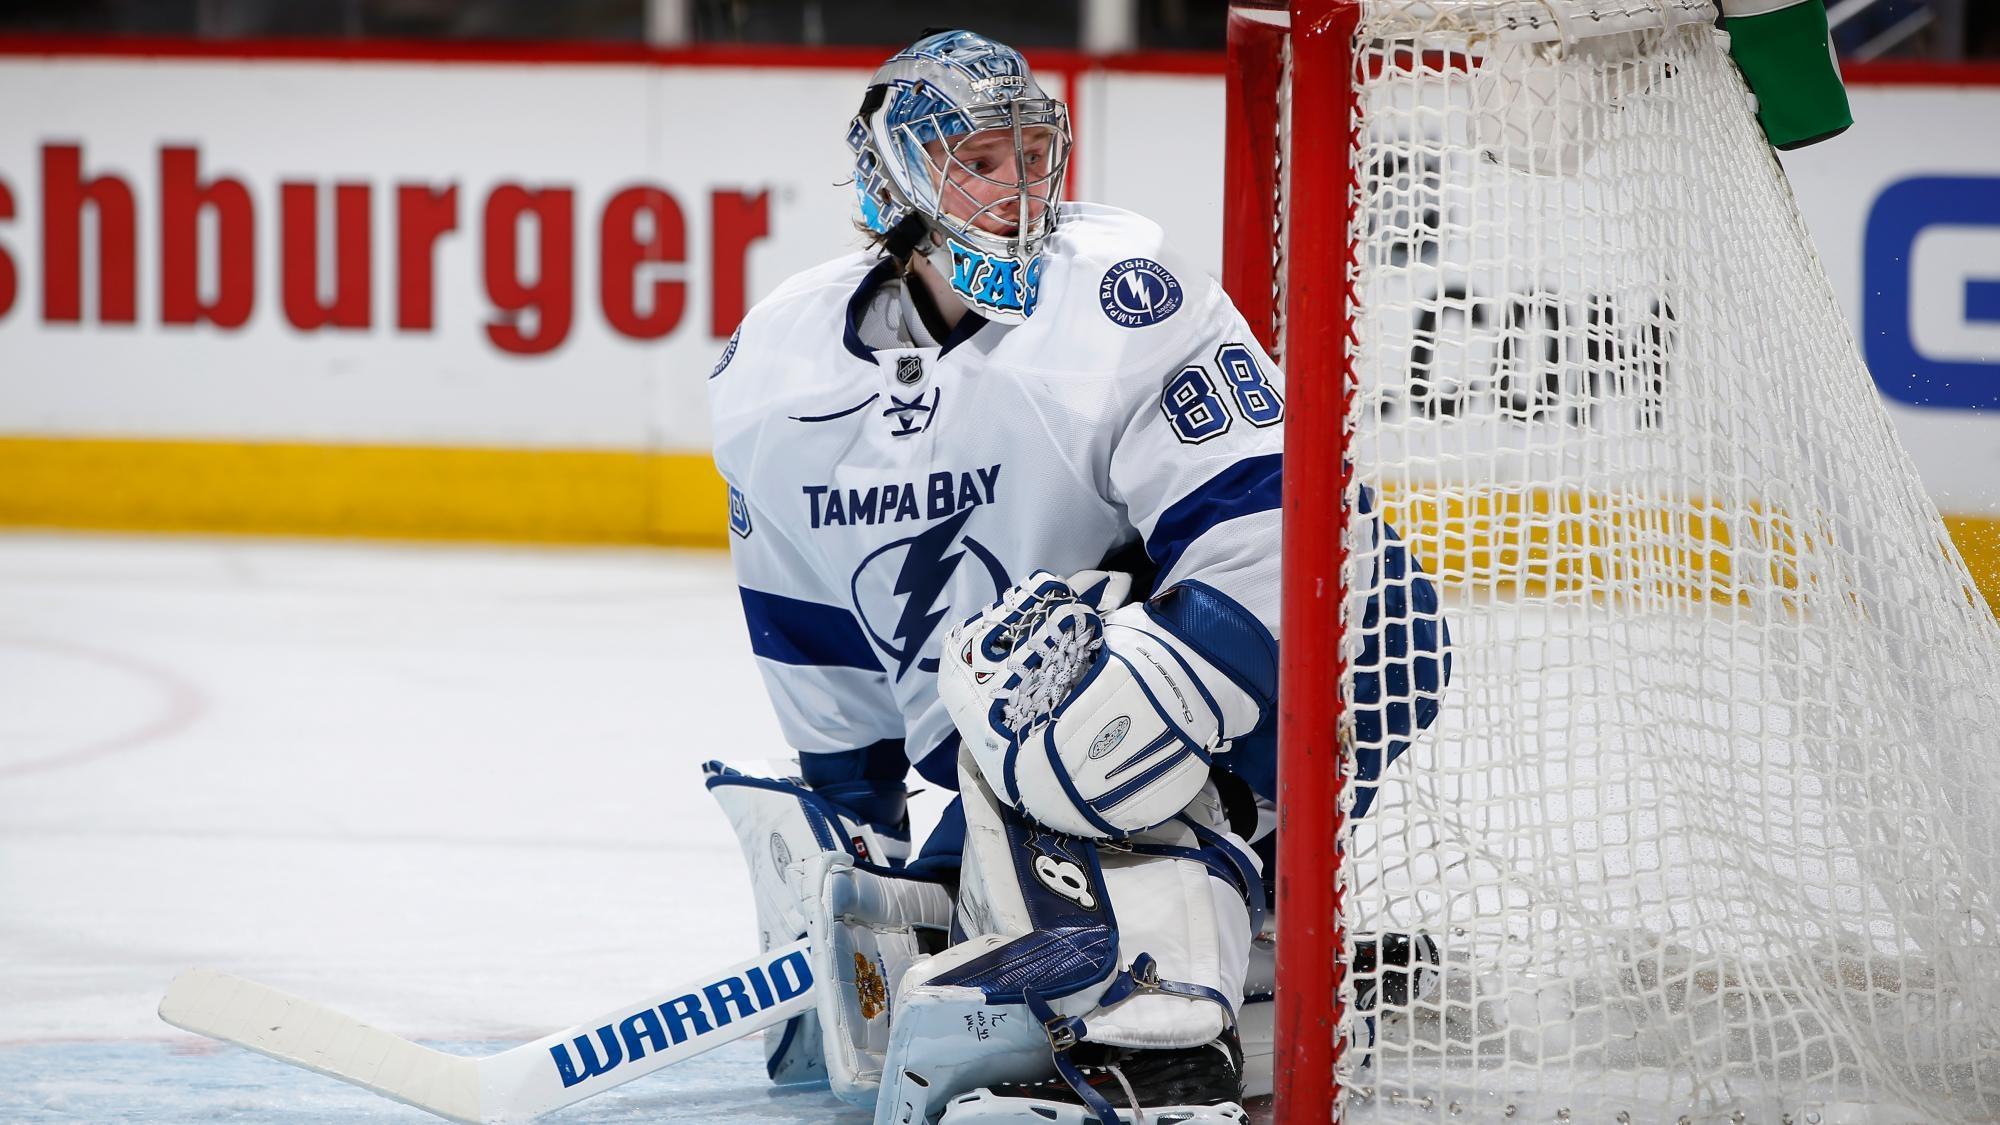 Монреаль — Флорида. Прогноз на матч регулярного чемпионата НХЛ